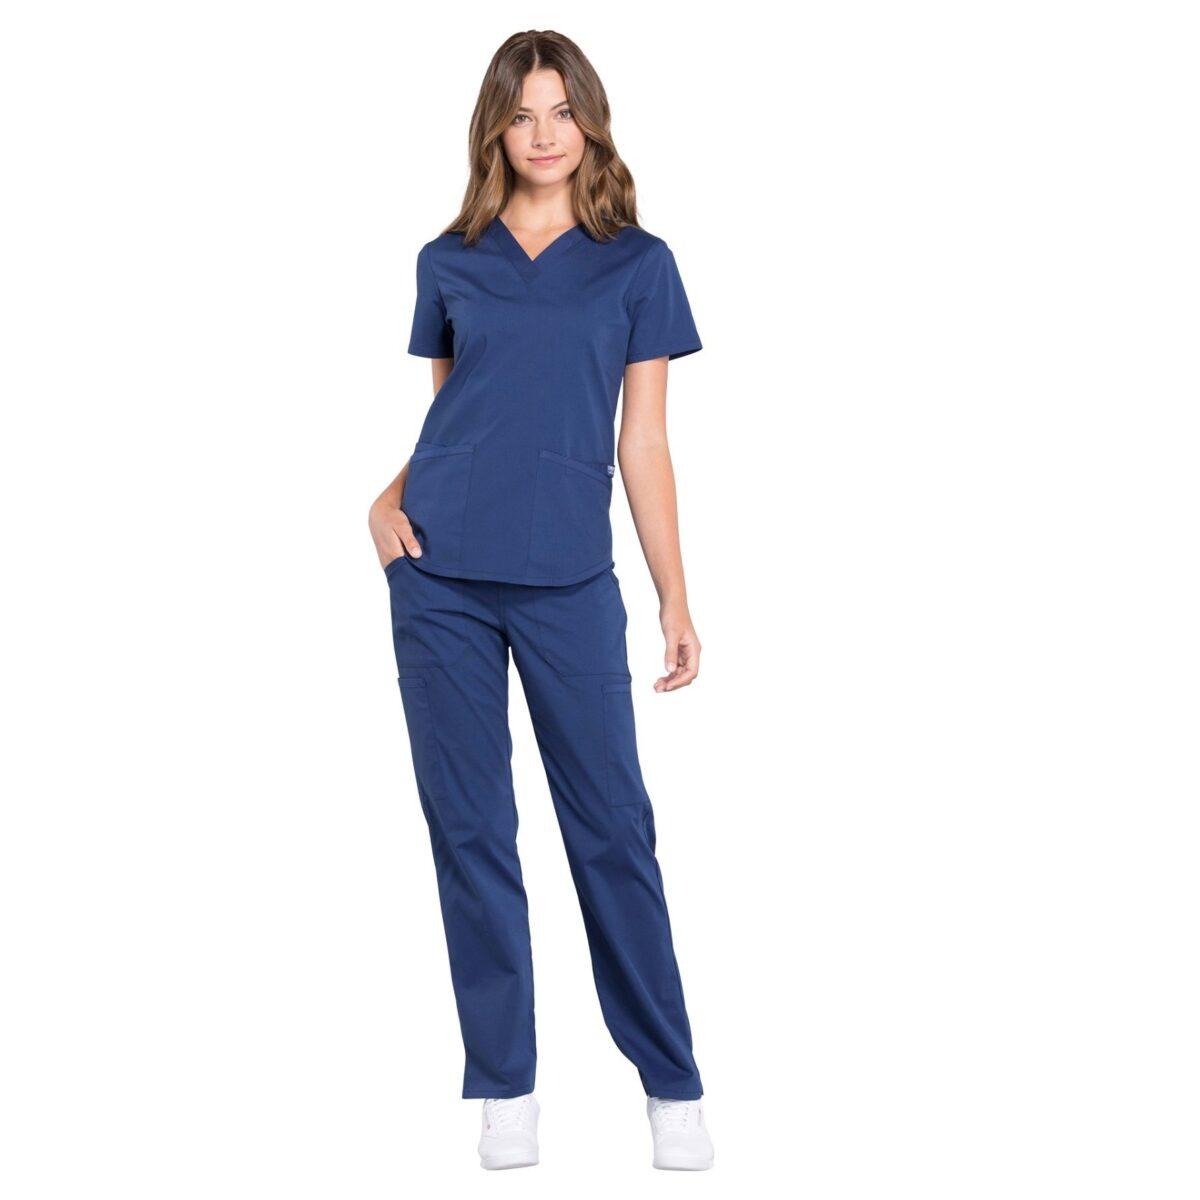 Женский медицинский костюм Cherokee Professionals - цвет синий